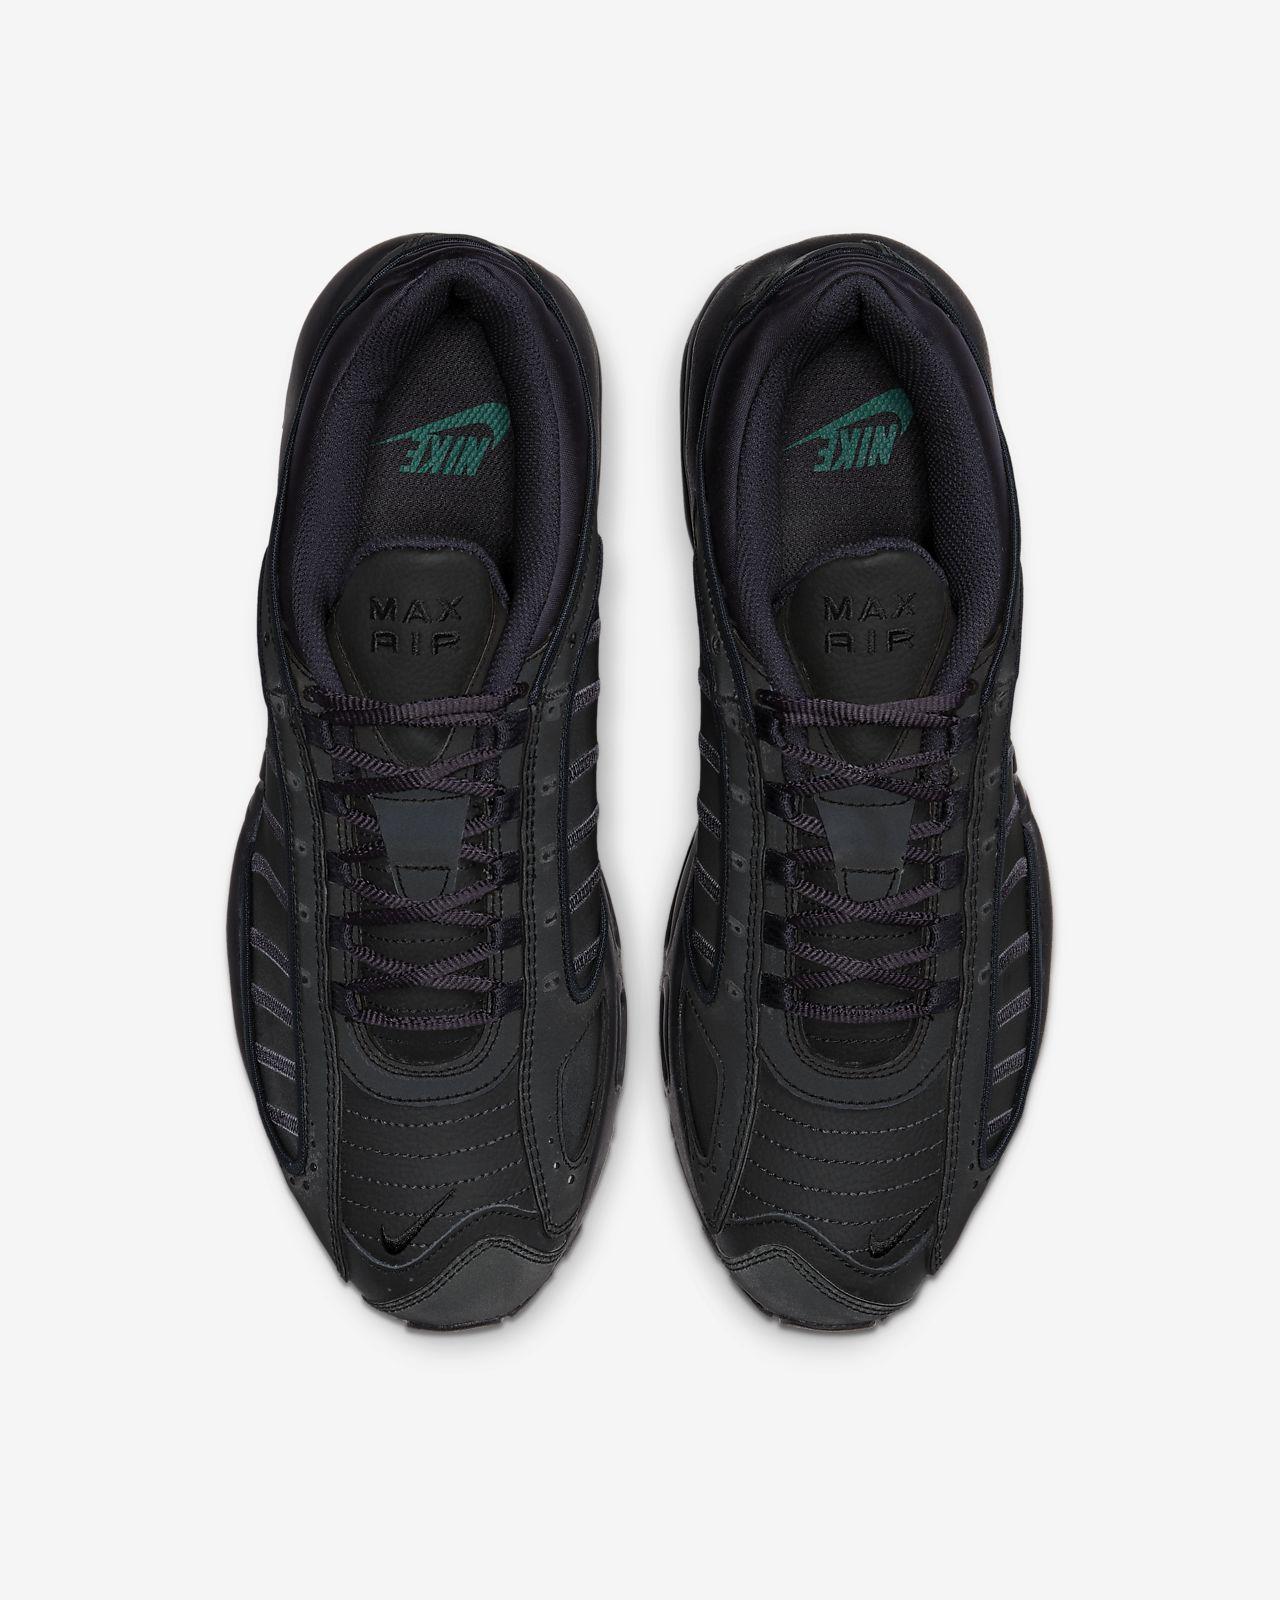 Nike Men's Air Max 97 black white, 44 ab 99,95 € im